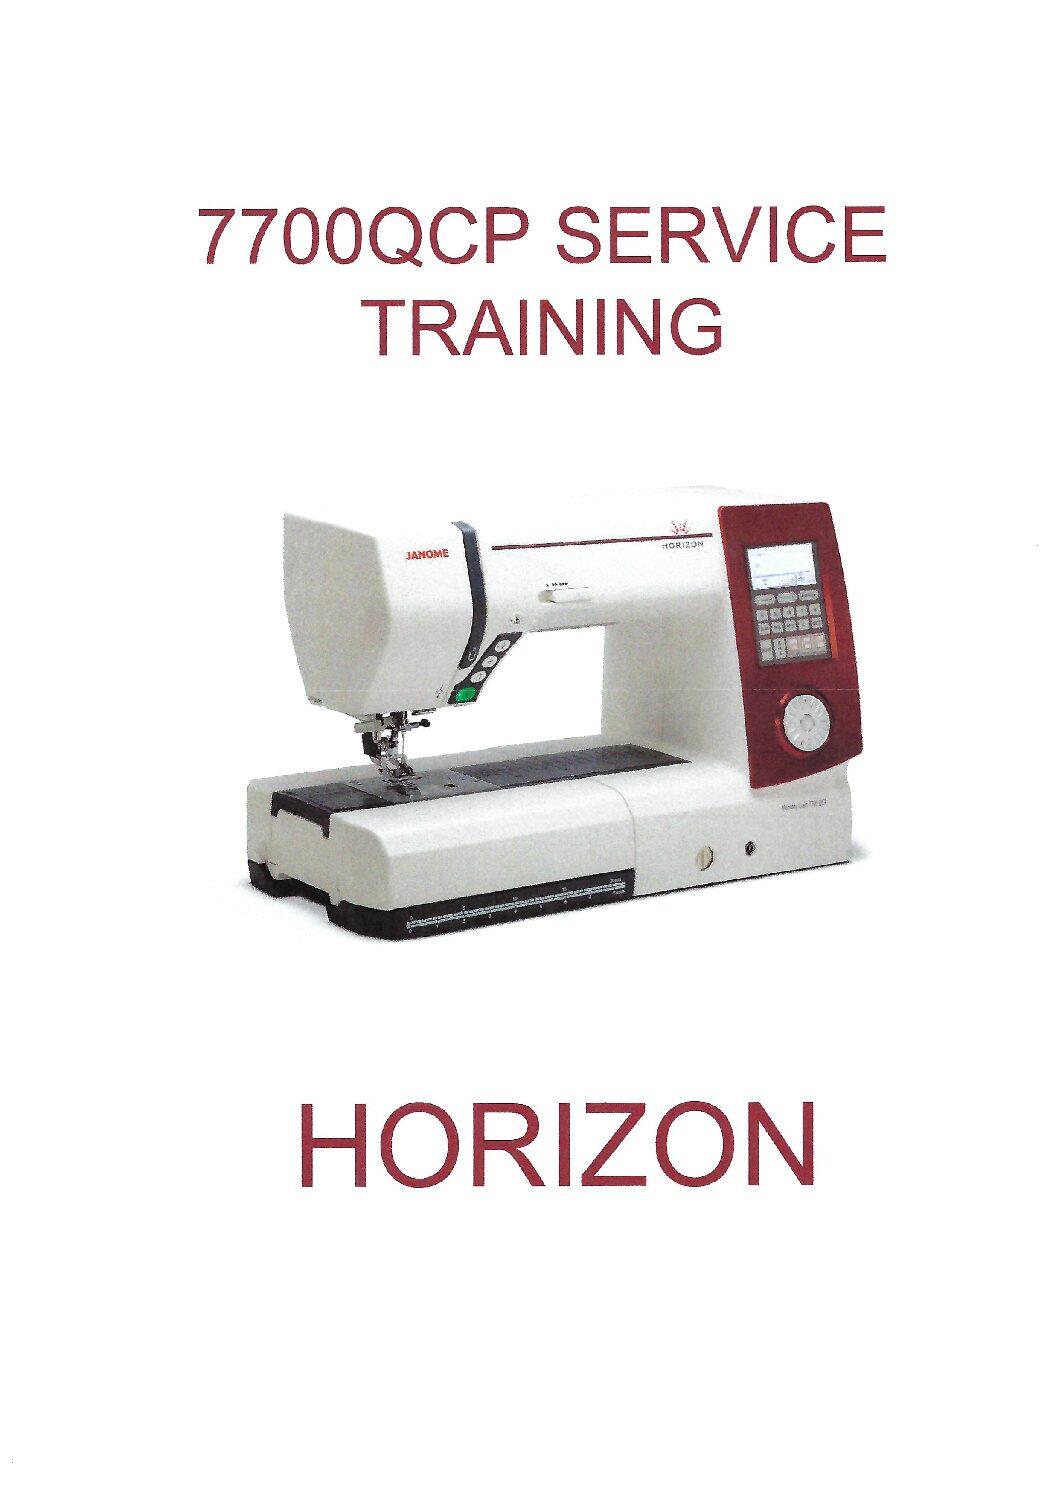 JANOME HORIZON MEMORY CRAFT 7700 QCP INSTRUCTION BOOK Pdf ...